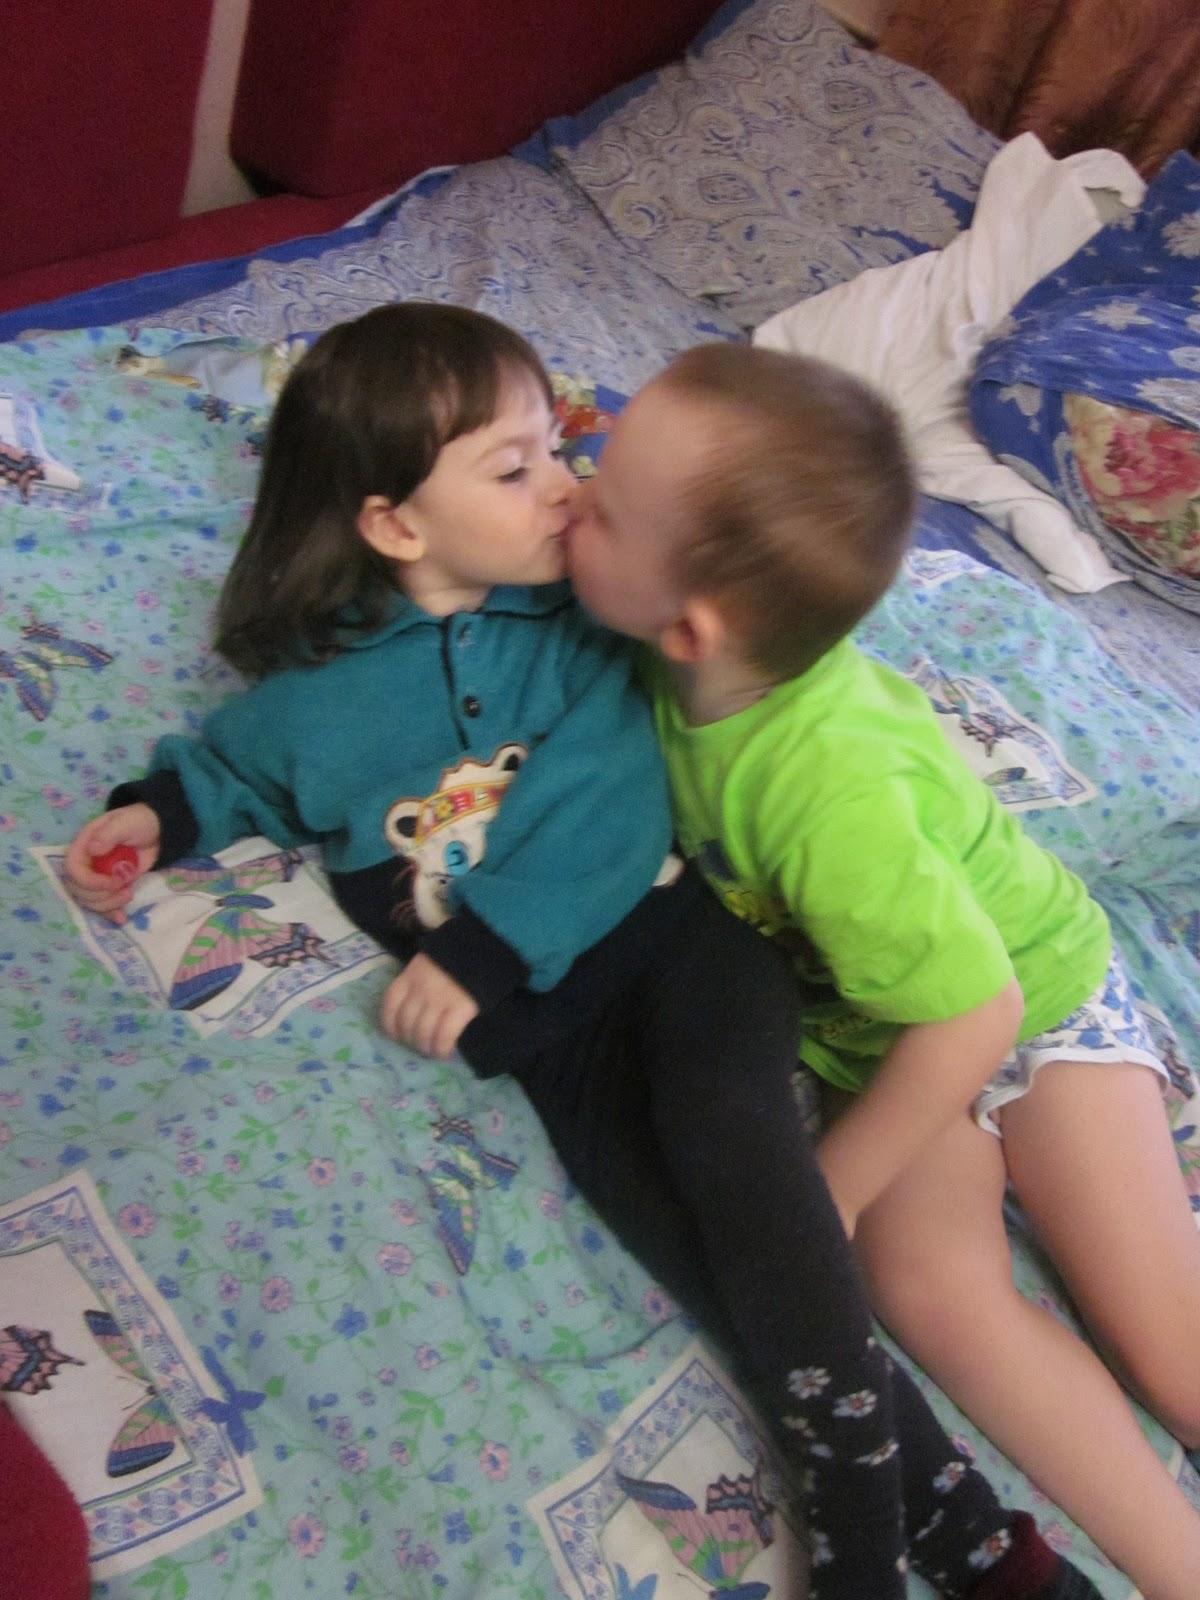 Брат дрочер трахает старшую сестру » Порно инцест онлайн ...